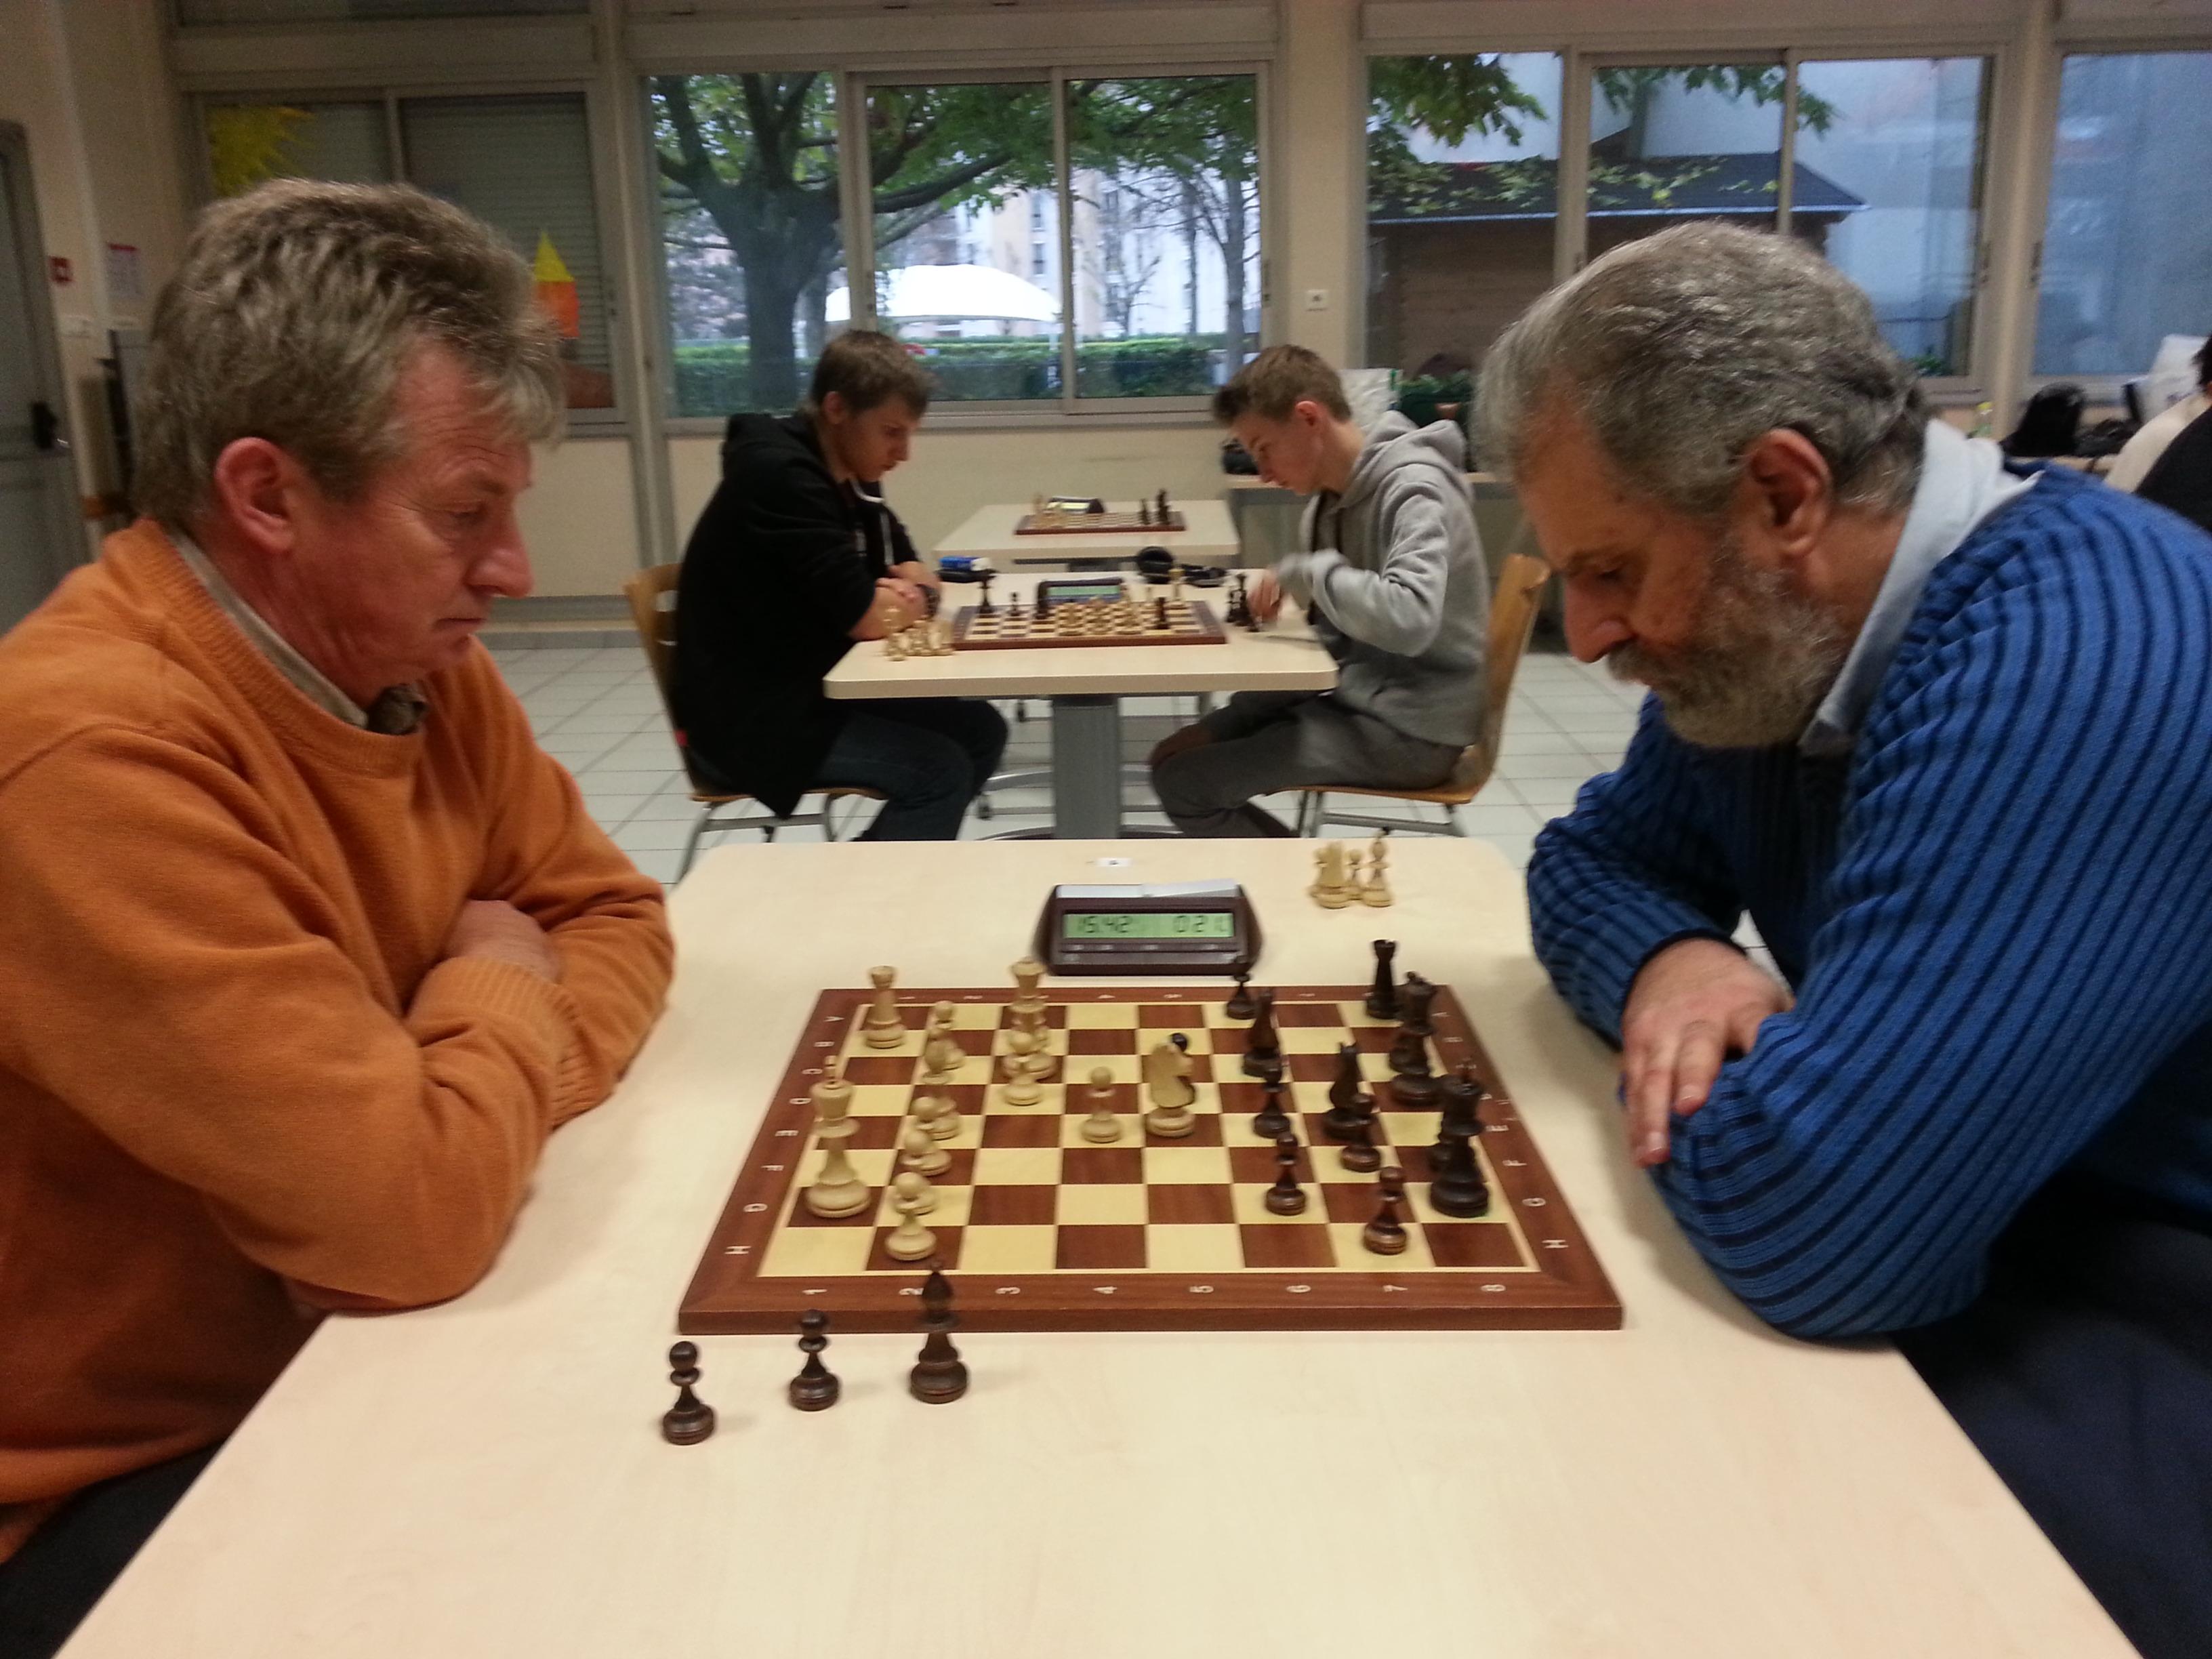 tournoi-interne-6-decembre-2014-academie-echecs-philidor-5